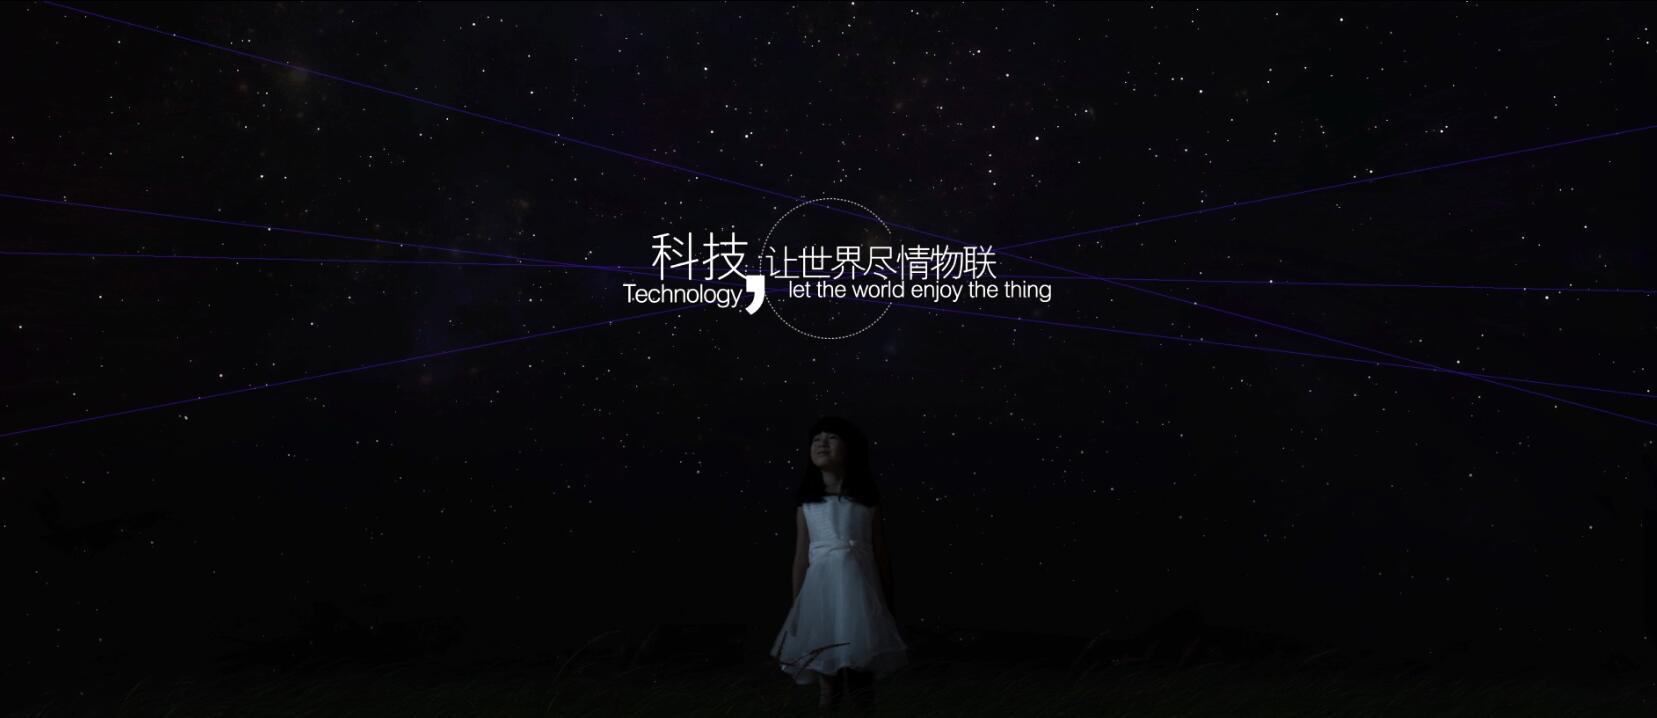 永利402com官网电力宣传片